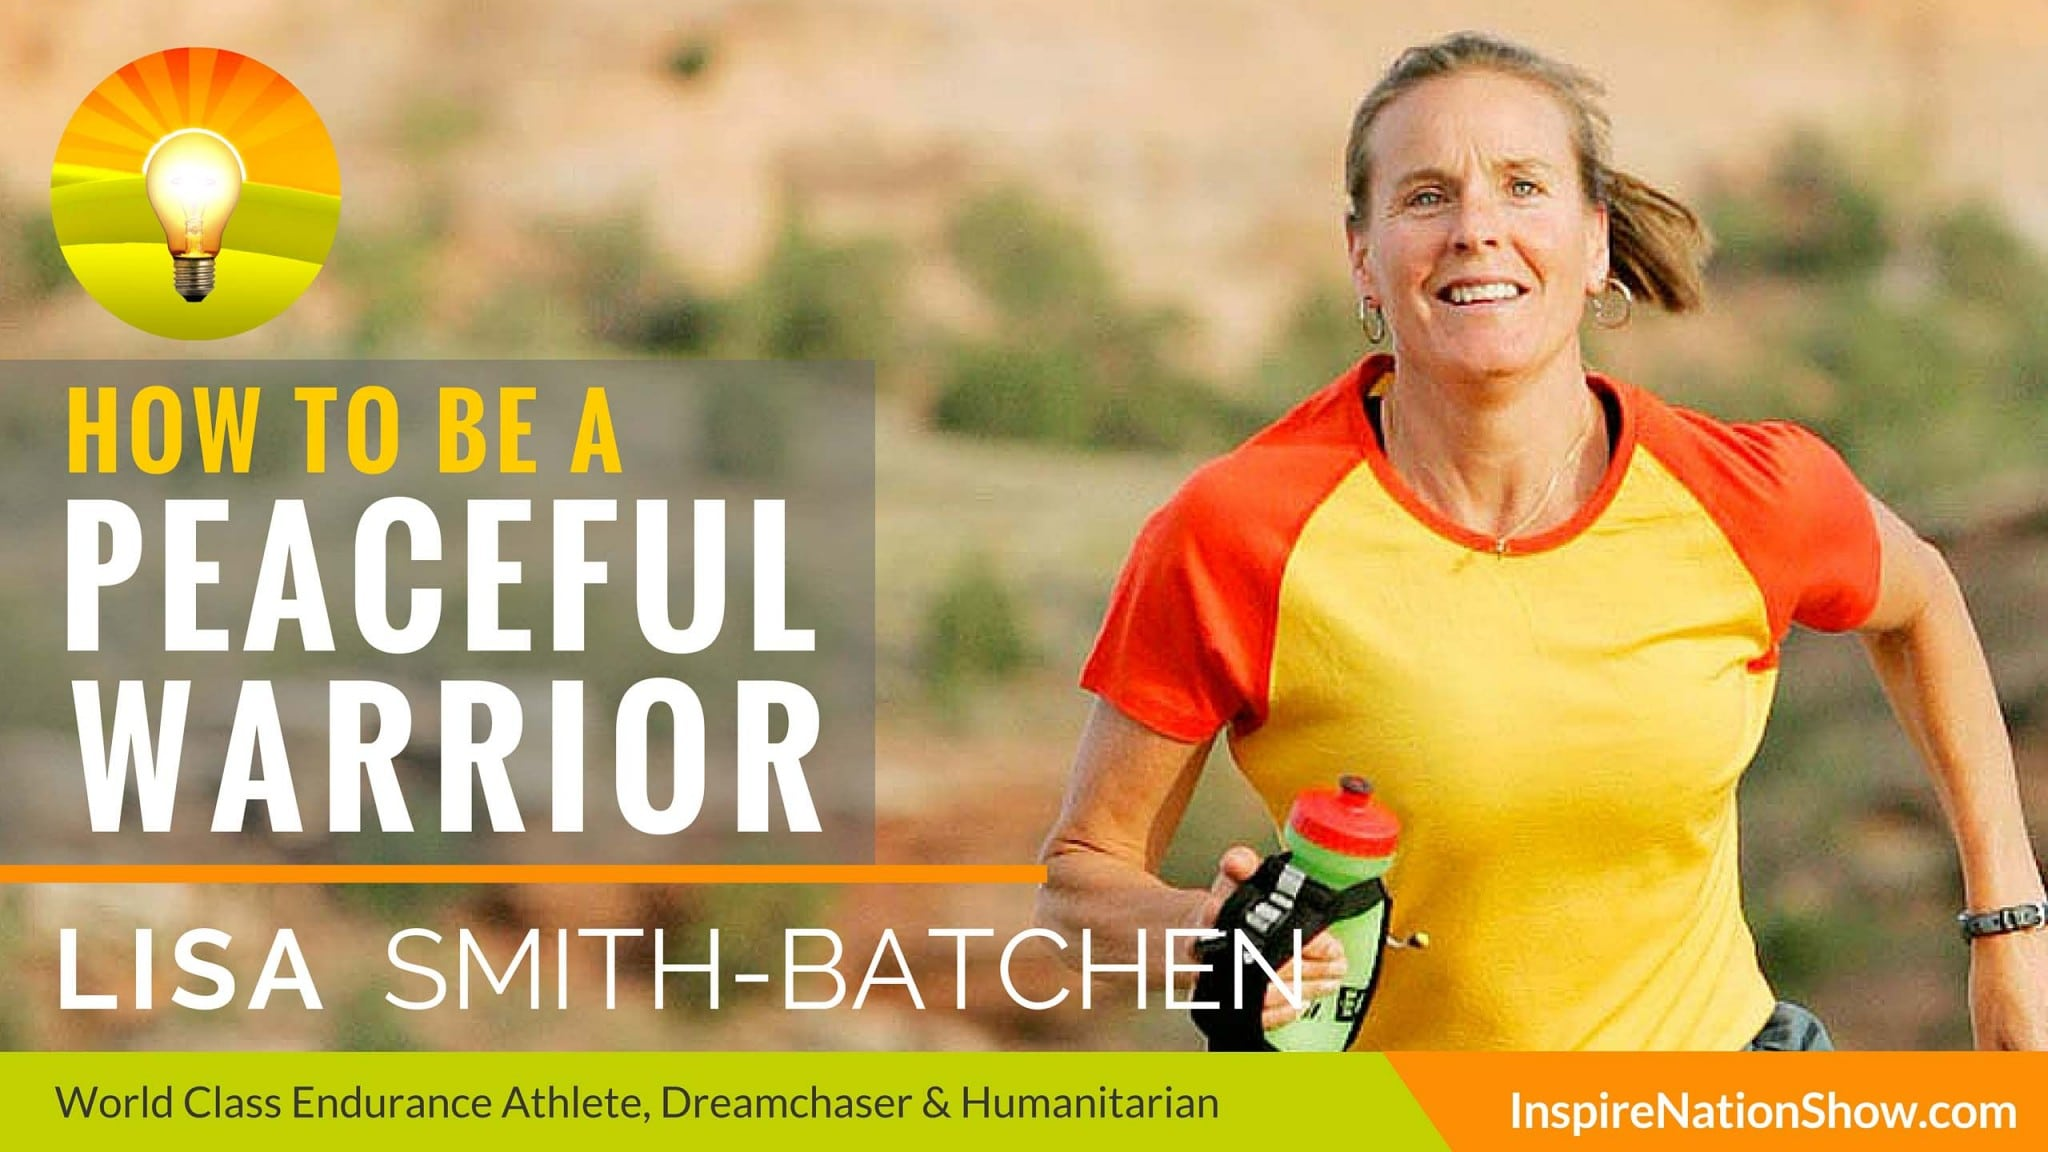 Lisa-Smith-Batchen-Inspire-Nation-show-podcast-badwater-ultramarathon-marathon-des-sables-sahara-endurance-50-miles-50-states-dreamchaser-foundation